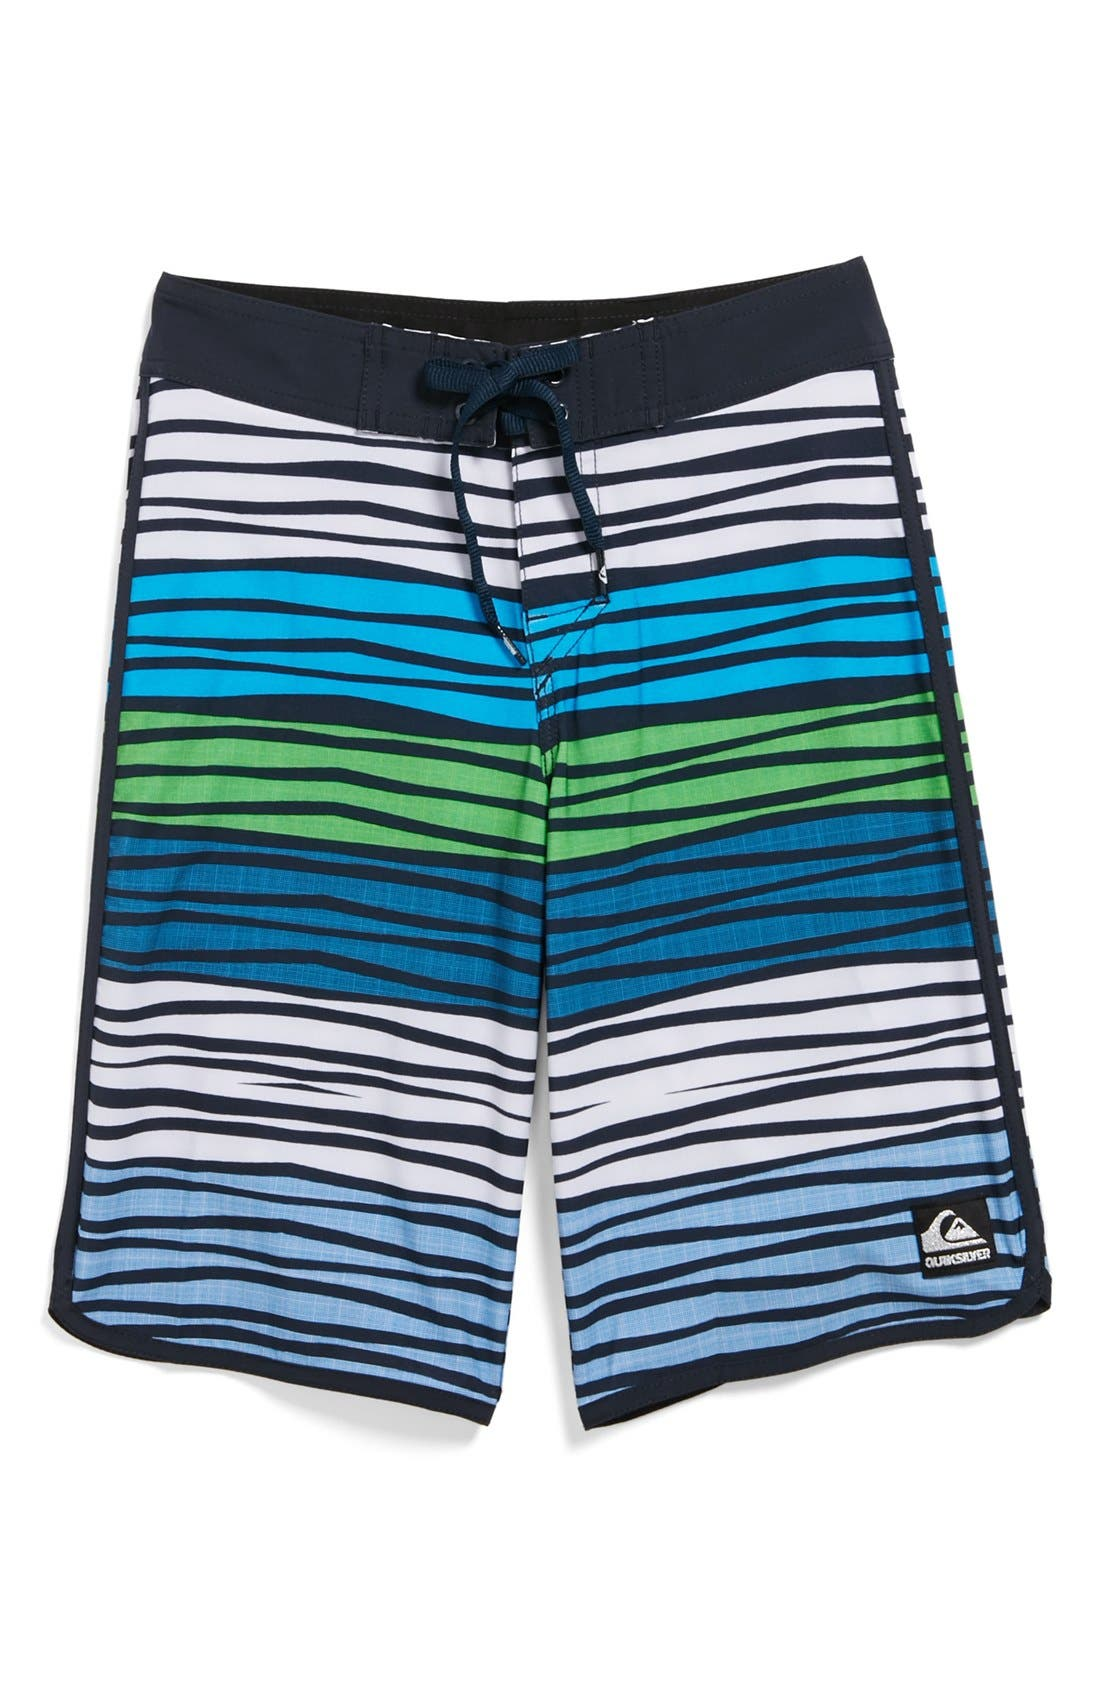 Alternate Image 1 Selected - Quiksilver 'Ratio' Board Shorts (Big Boys)